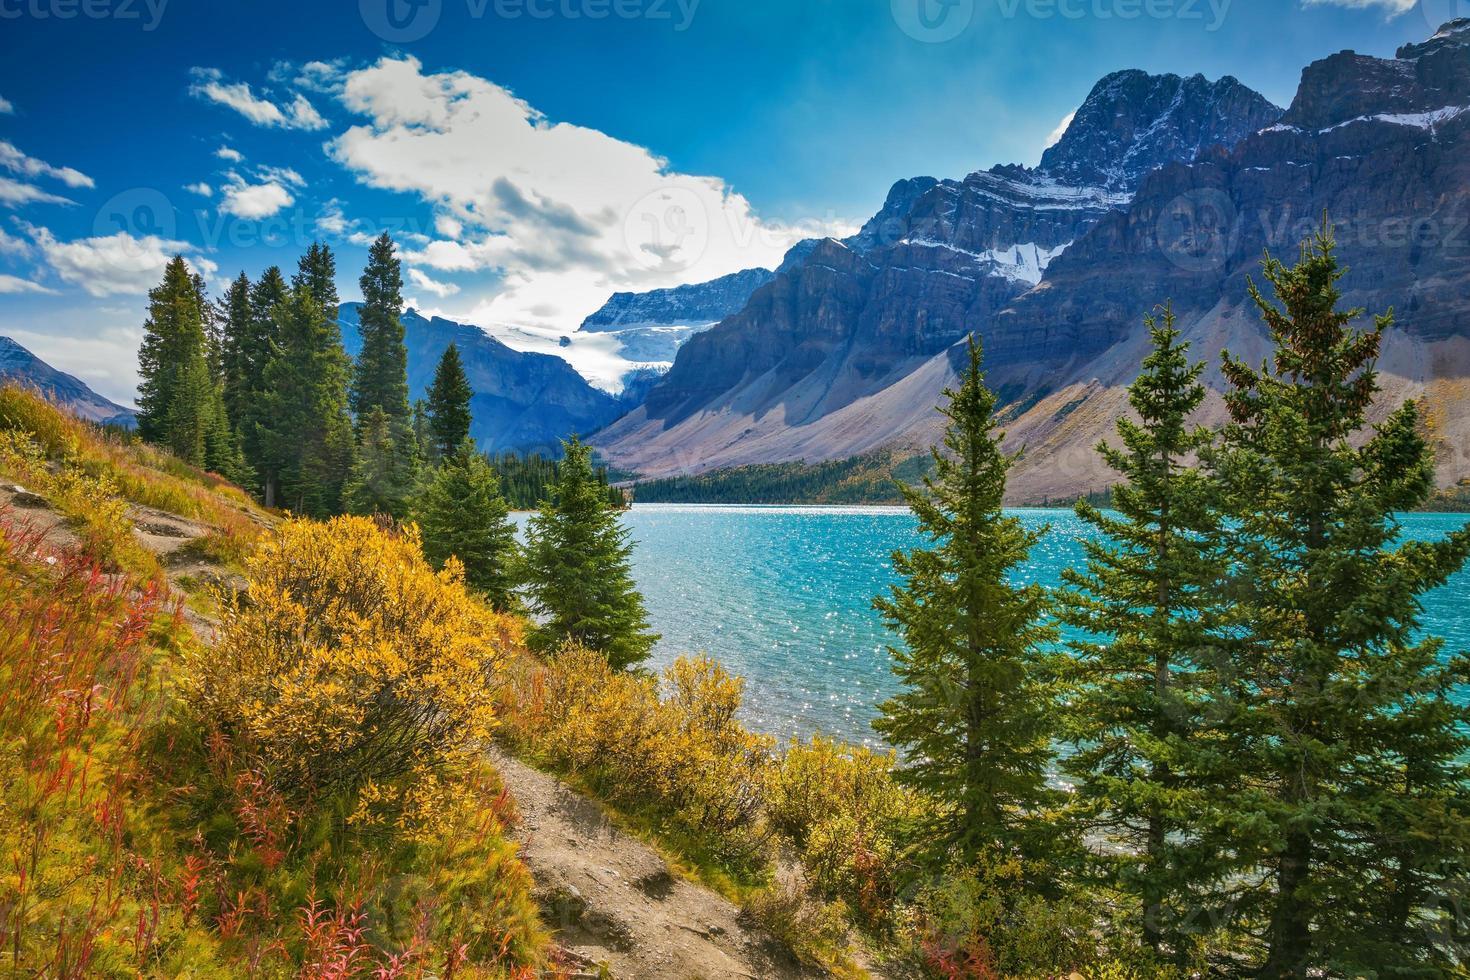 banff national park in de canadese rockies foto